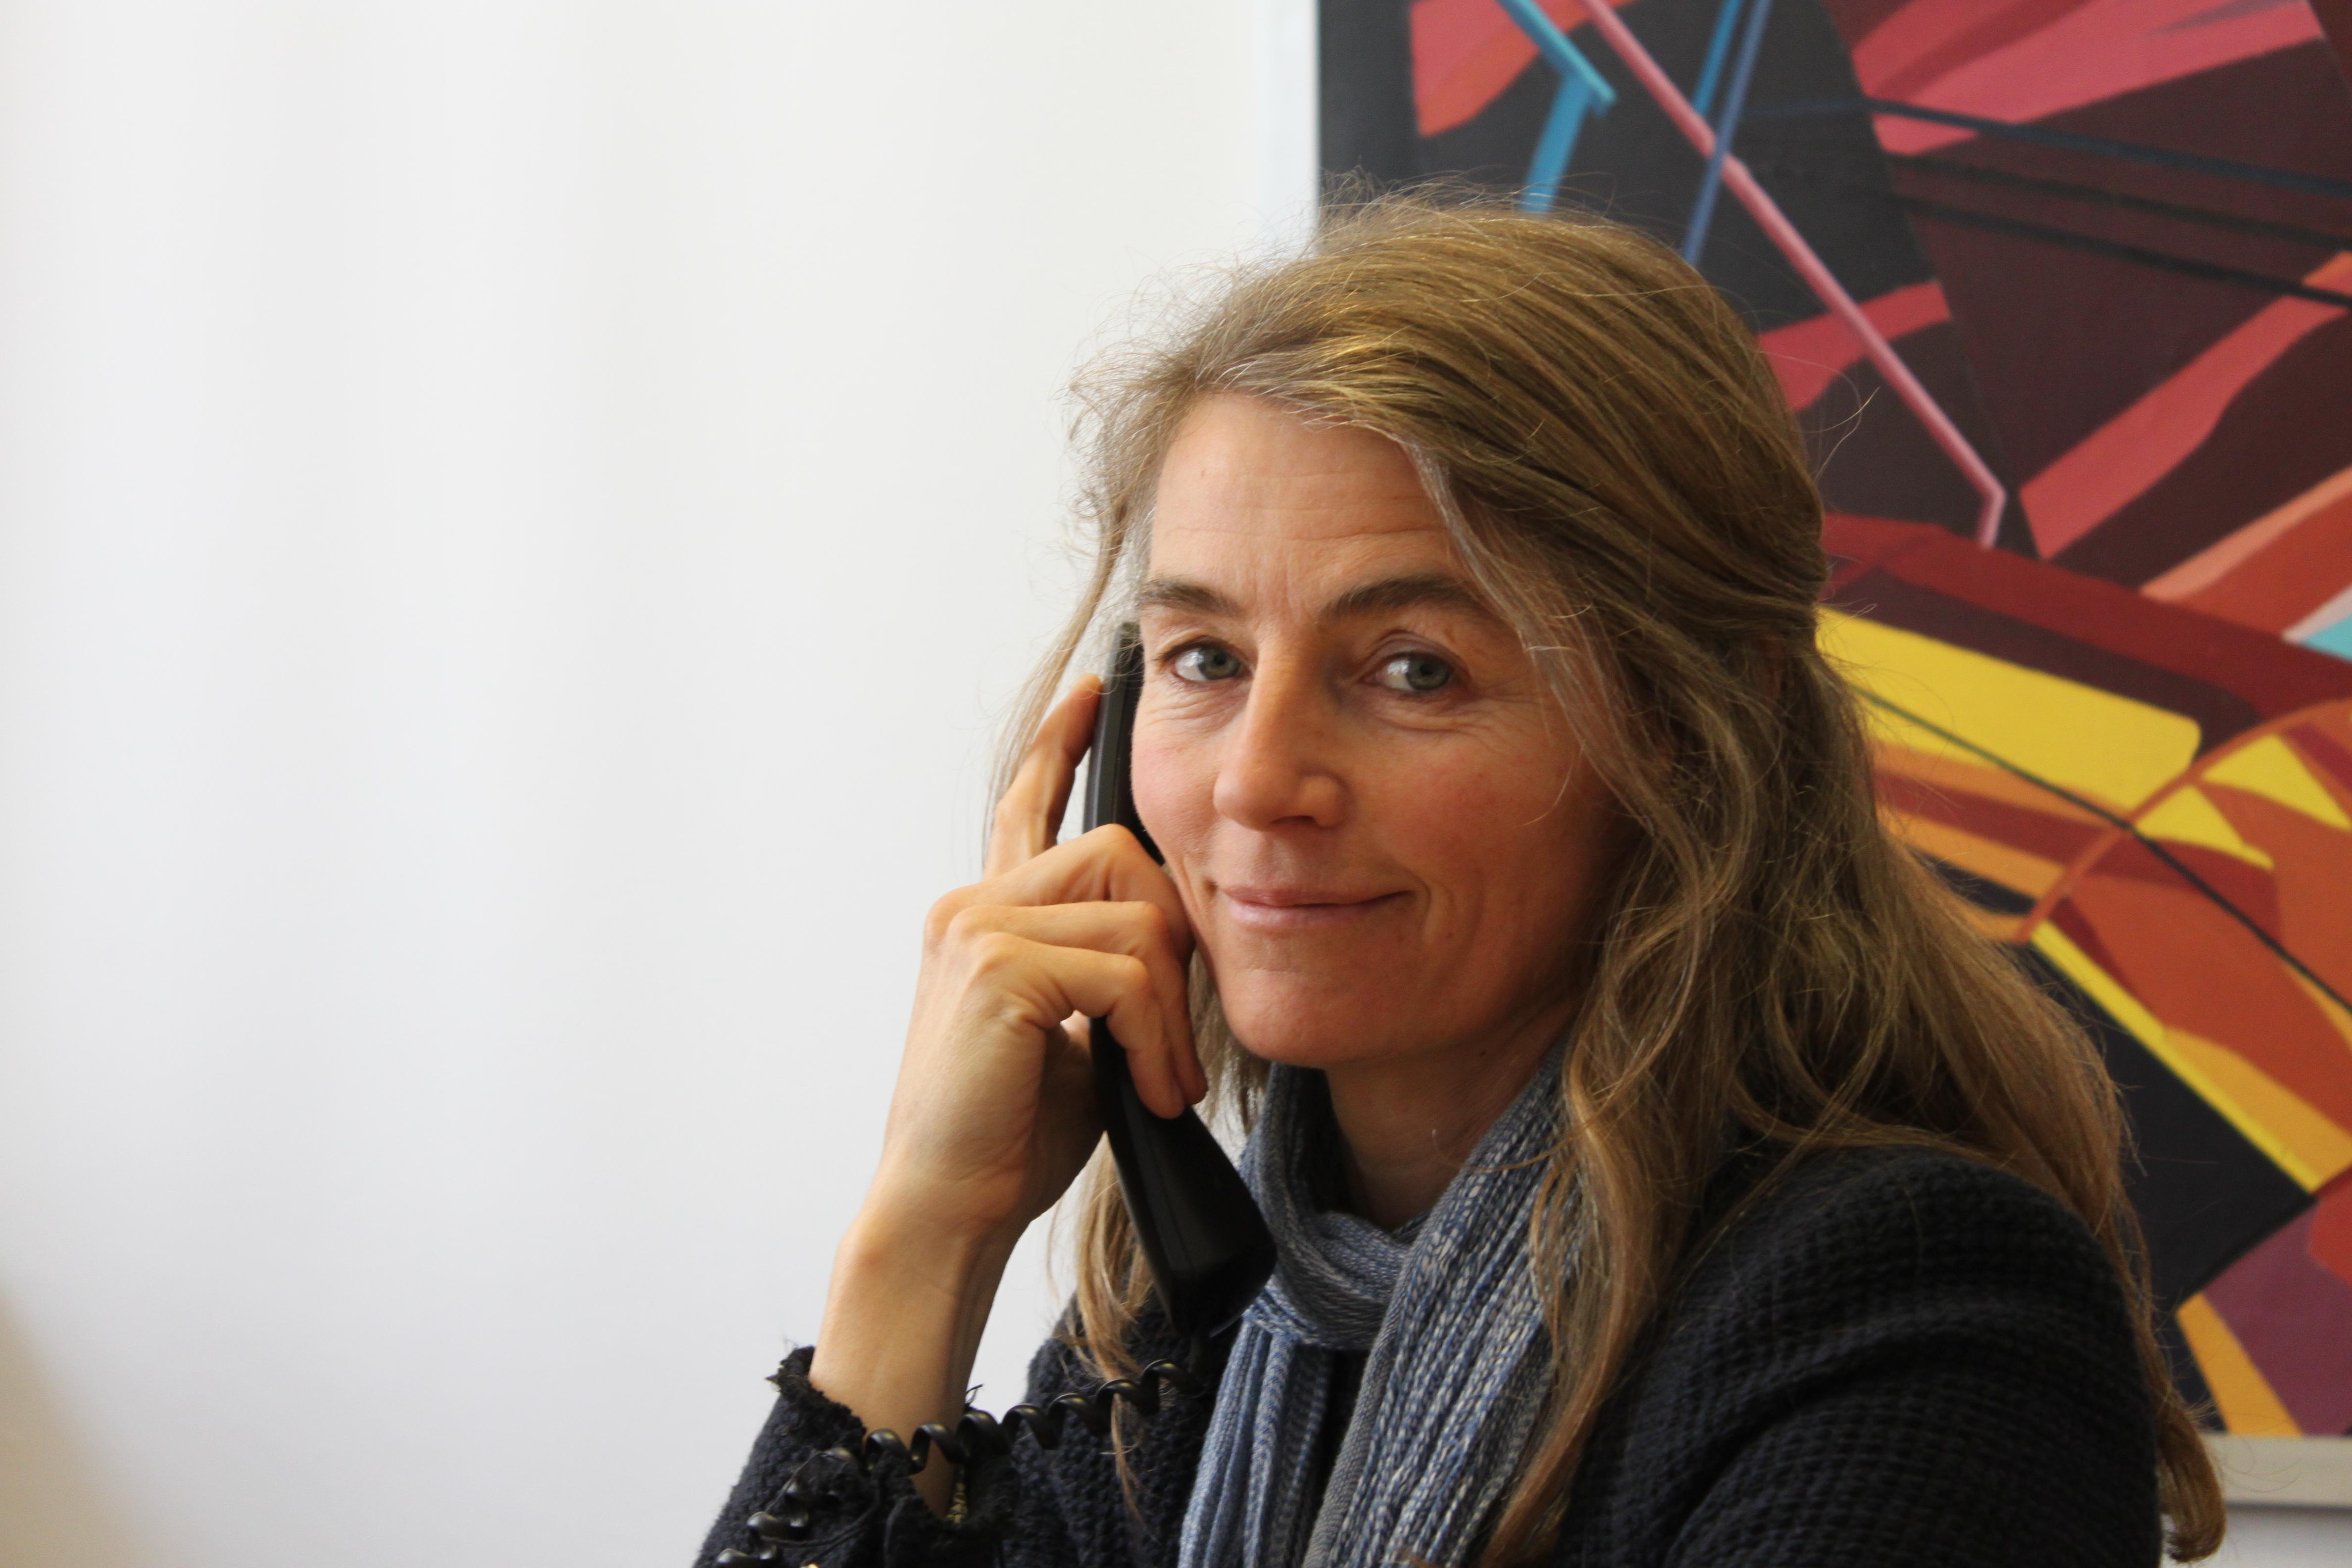 Amanda Werther